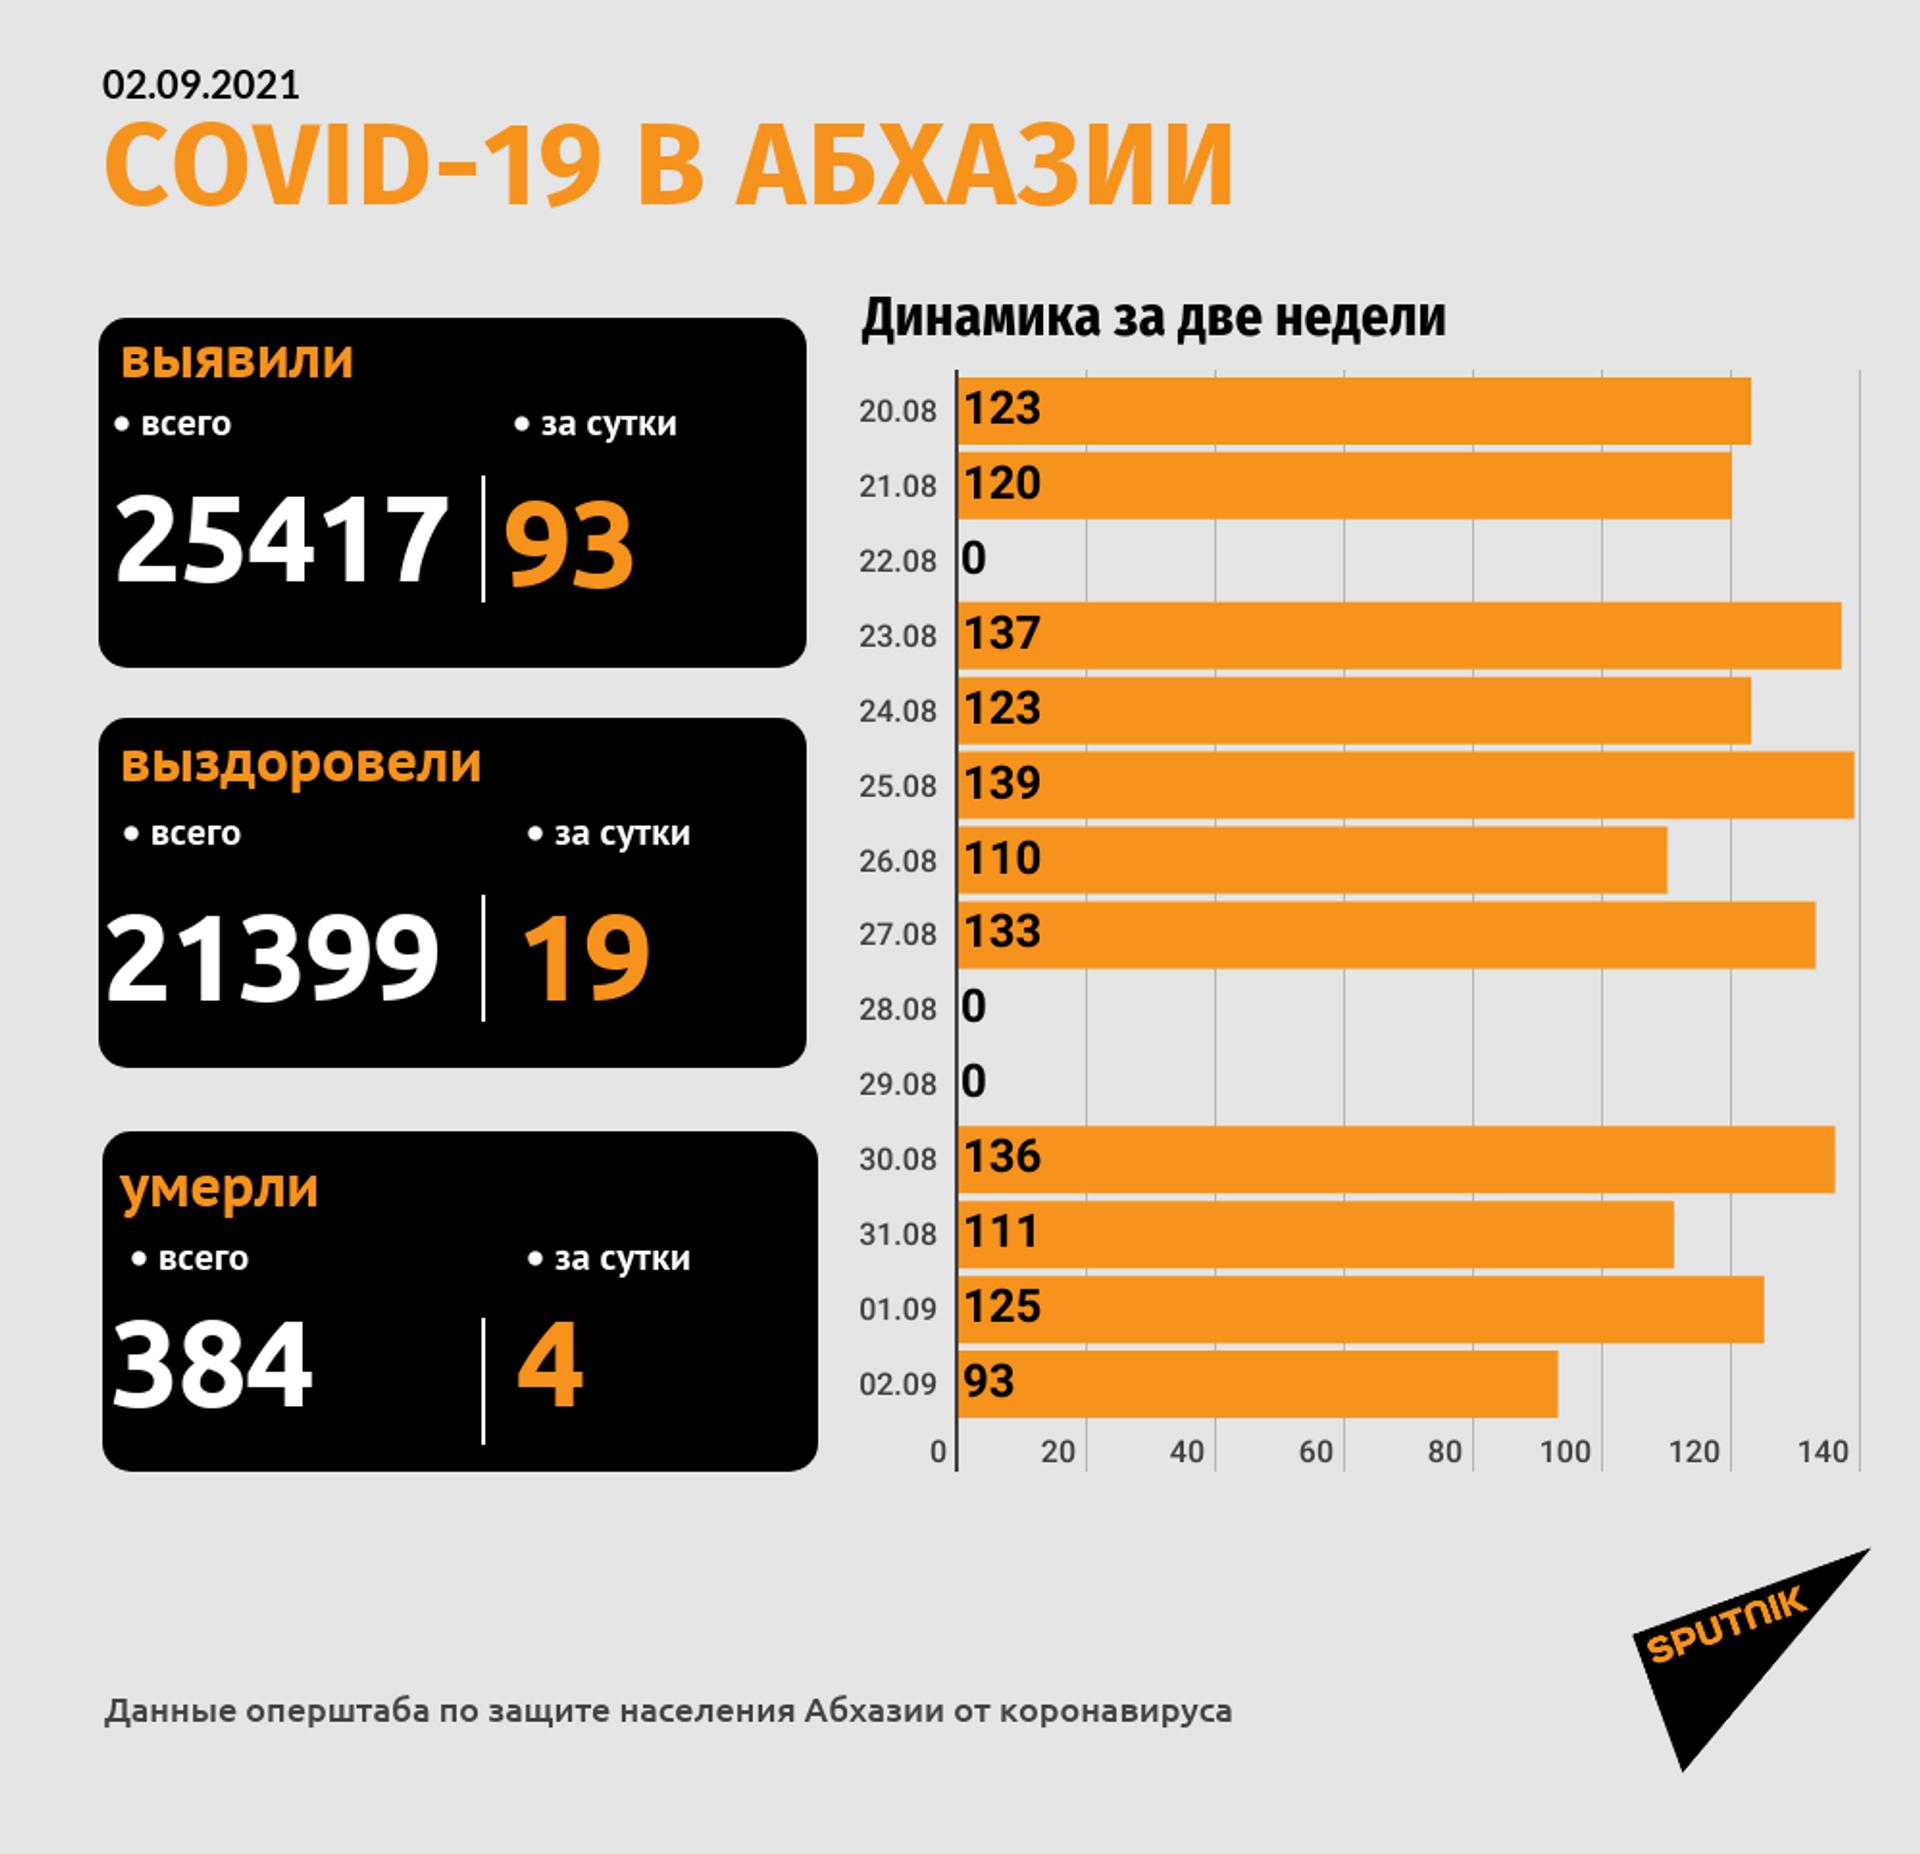 COVID - 19 в Абхазии - Sputnik Абхазия, 1920, 12.10.2021